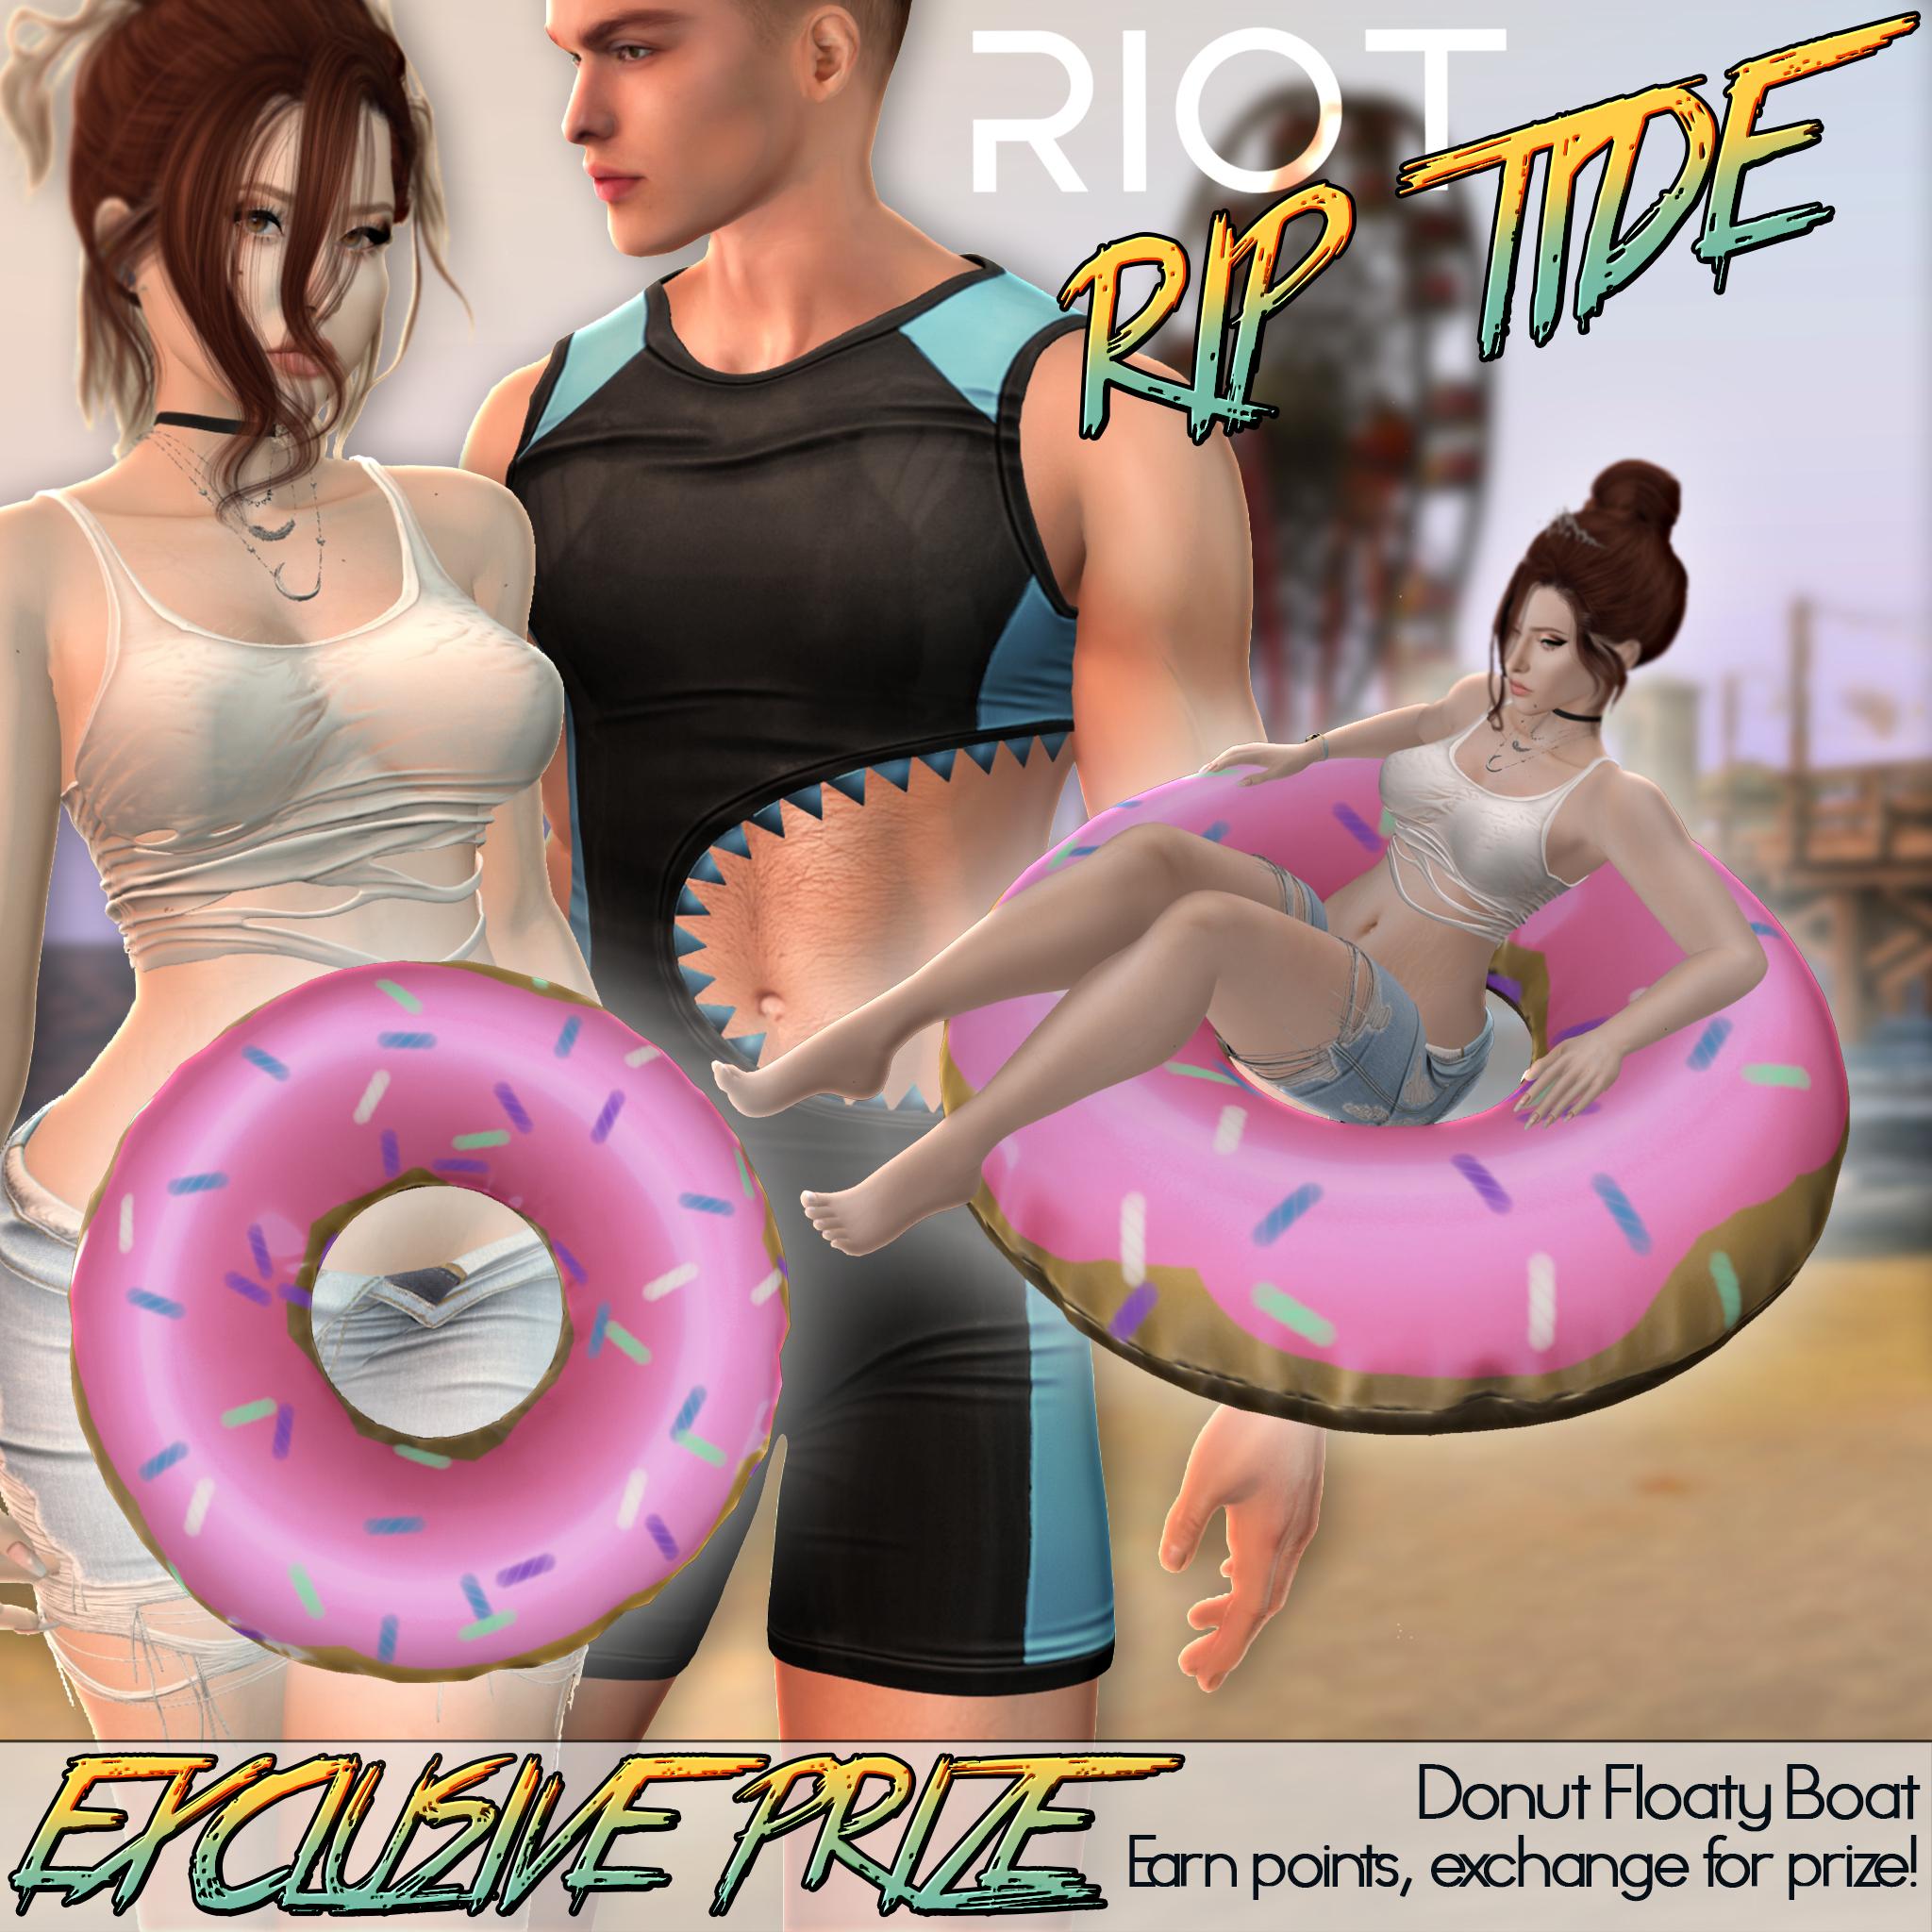 riot_rip_tide_exclusive.jpg